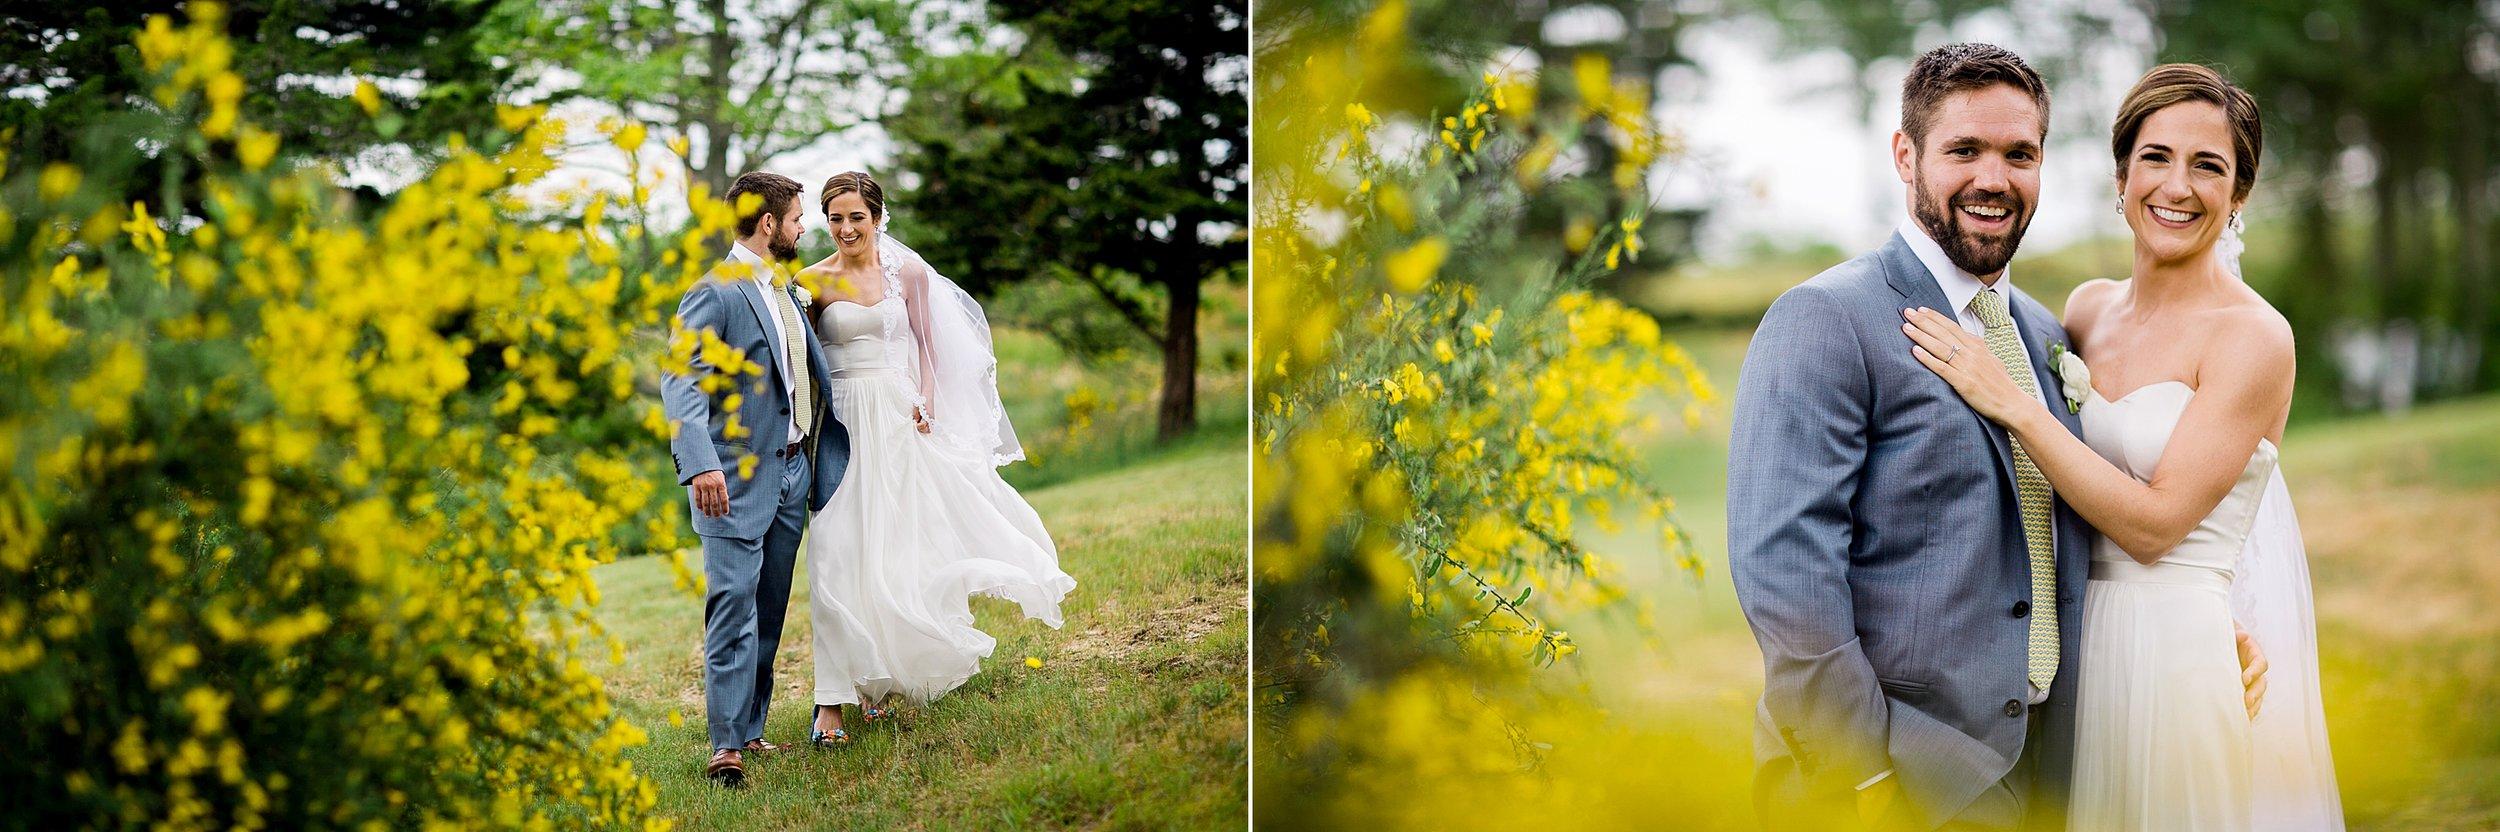 022 los angeles wedding photographer todd danforth photography cape cod.jpg